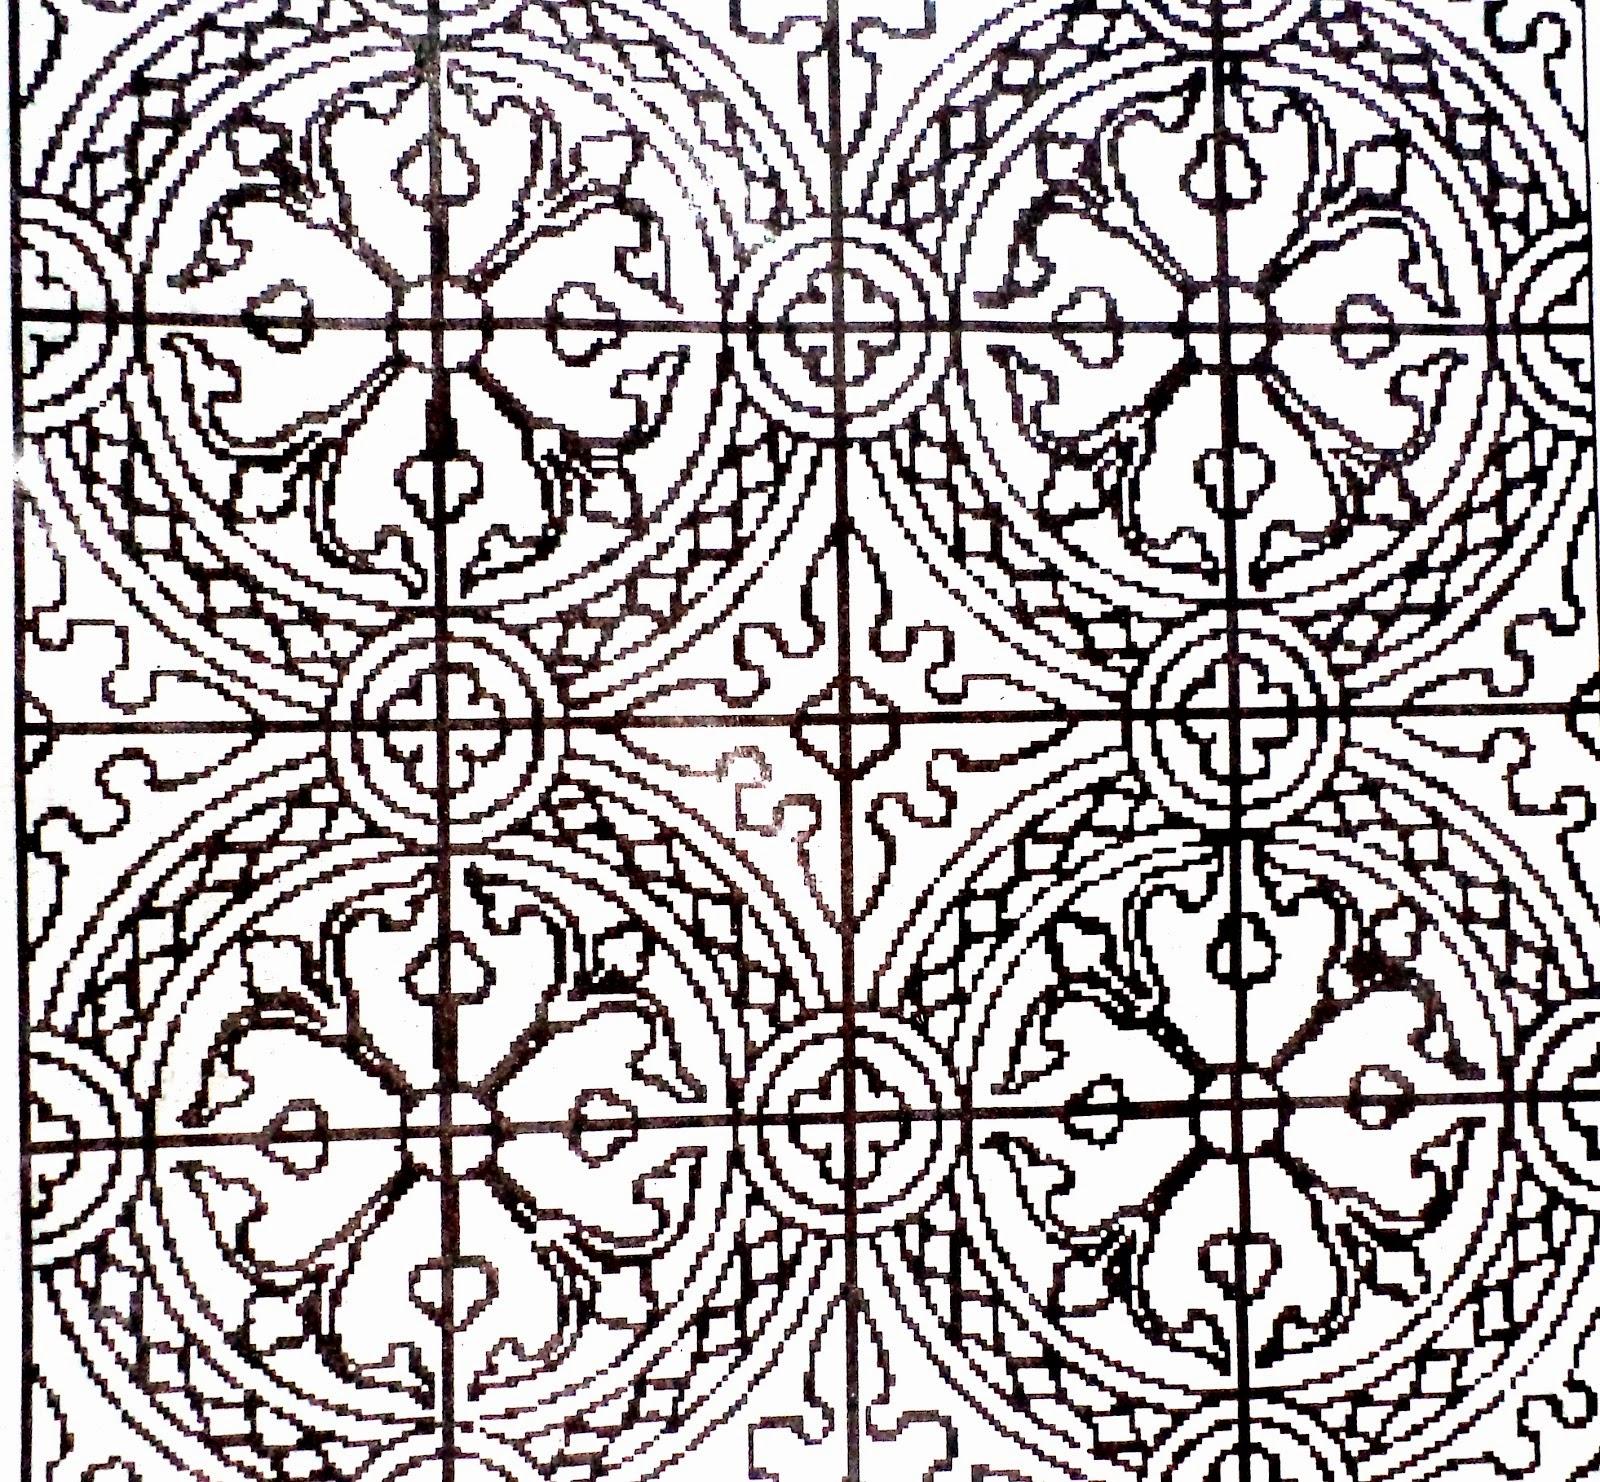 Contoh Batik Yang Gampang Di Gambar  Contoh O